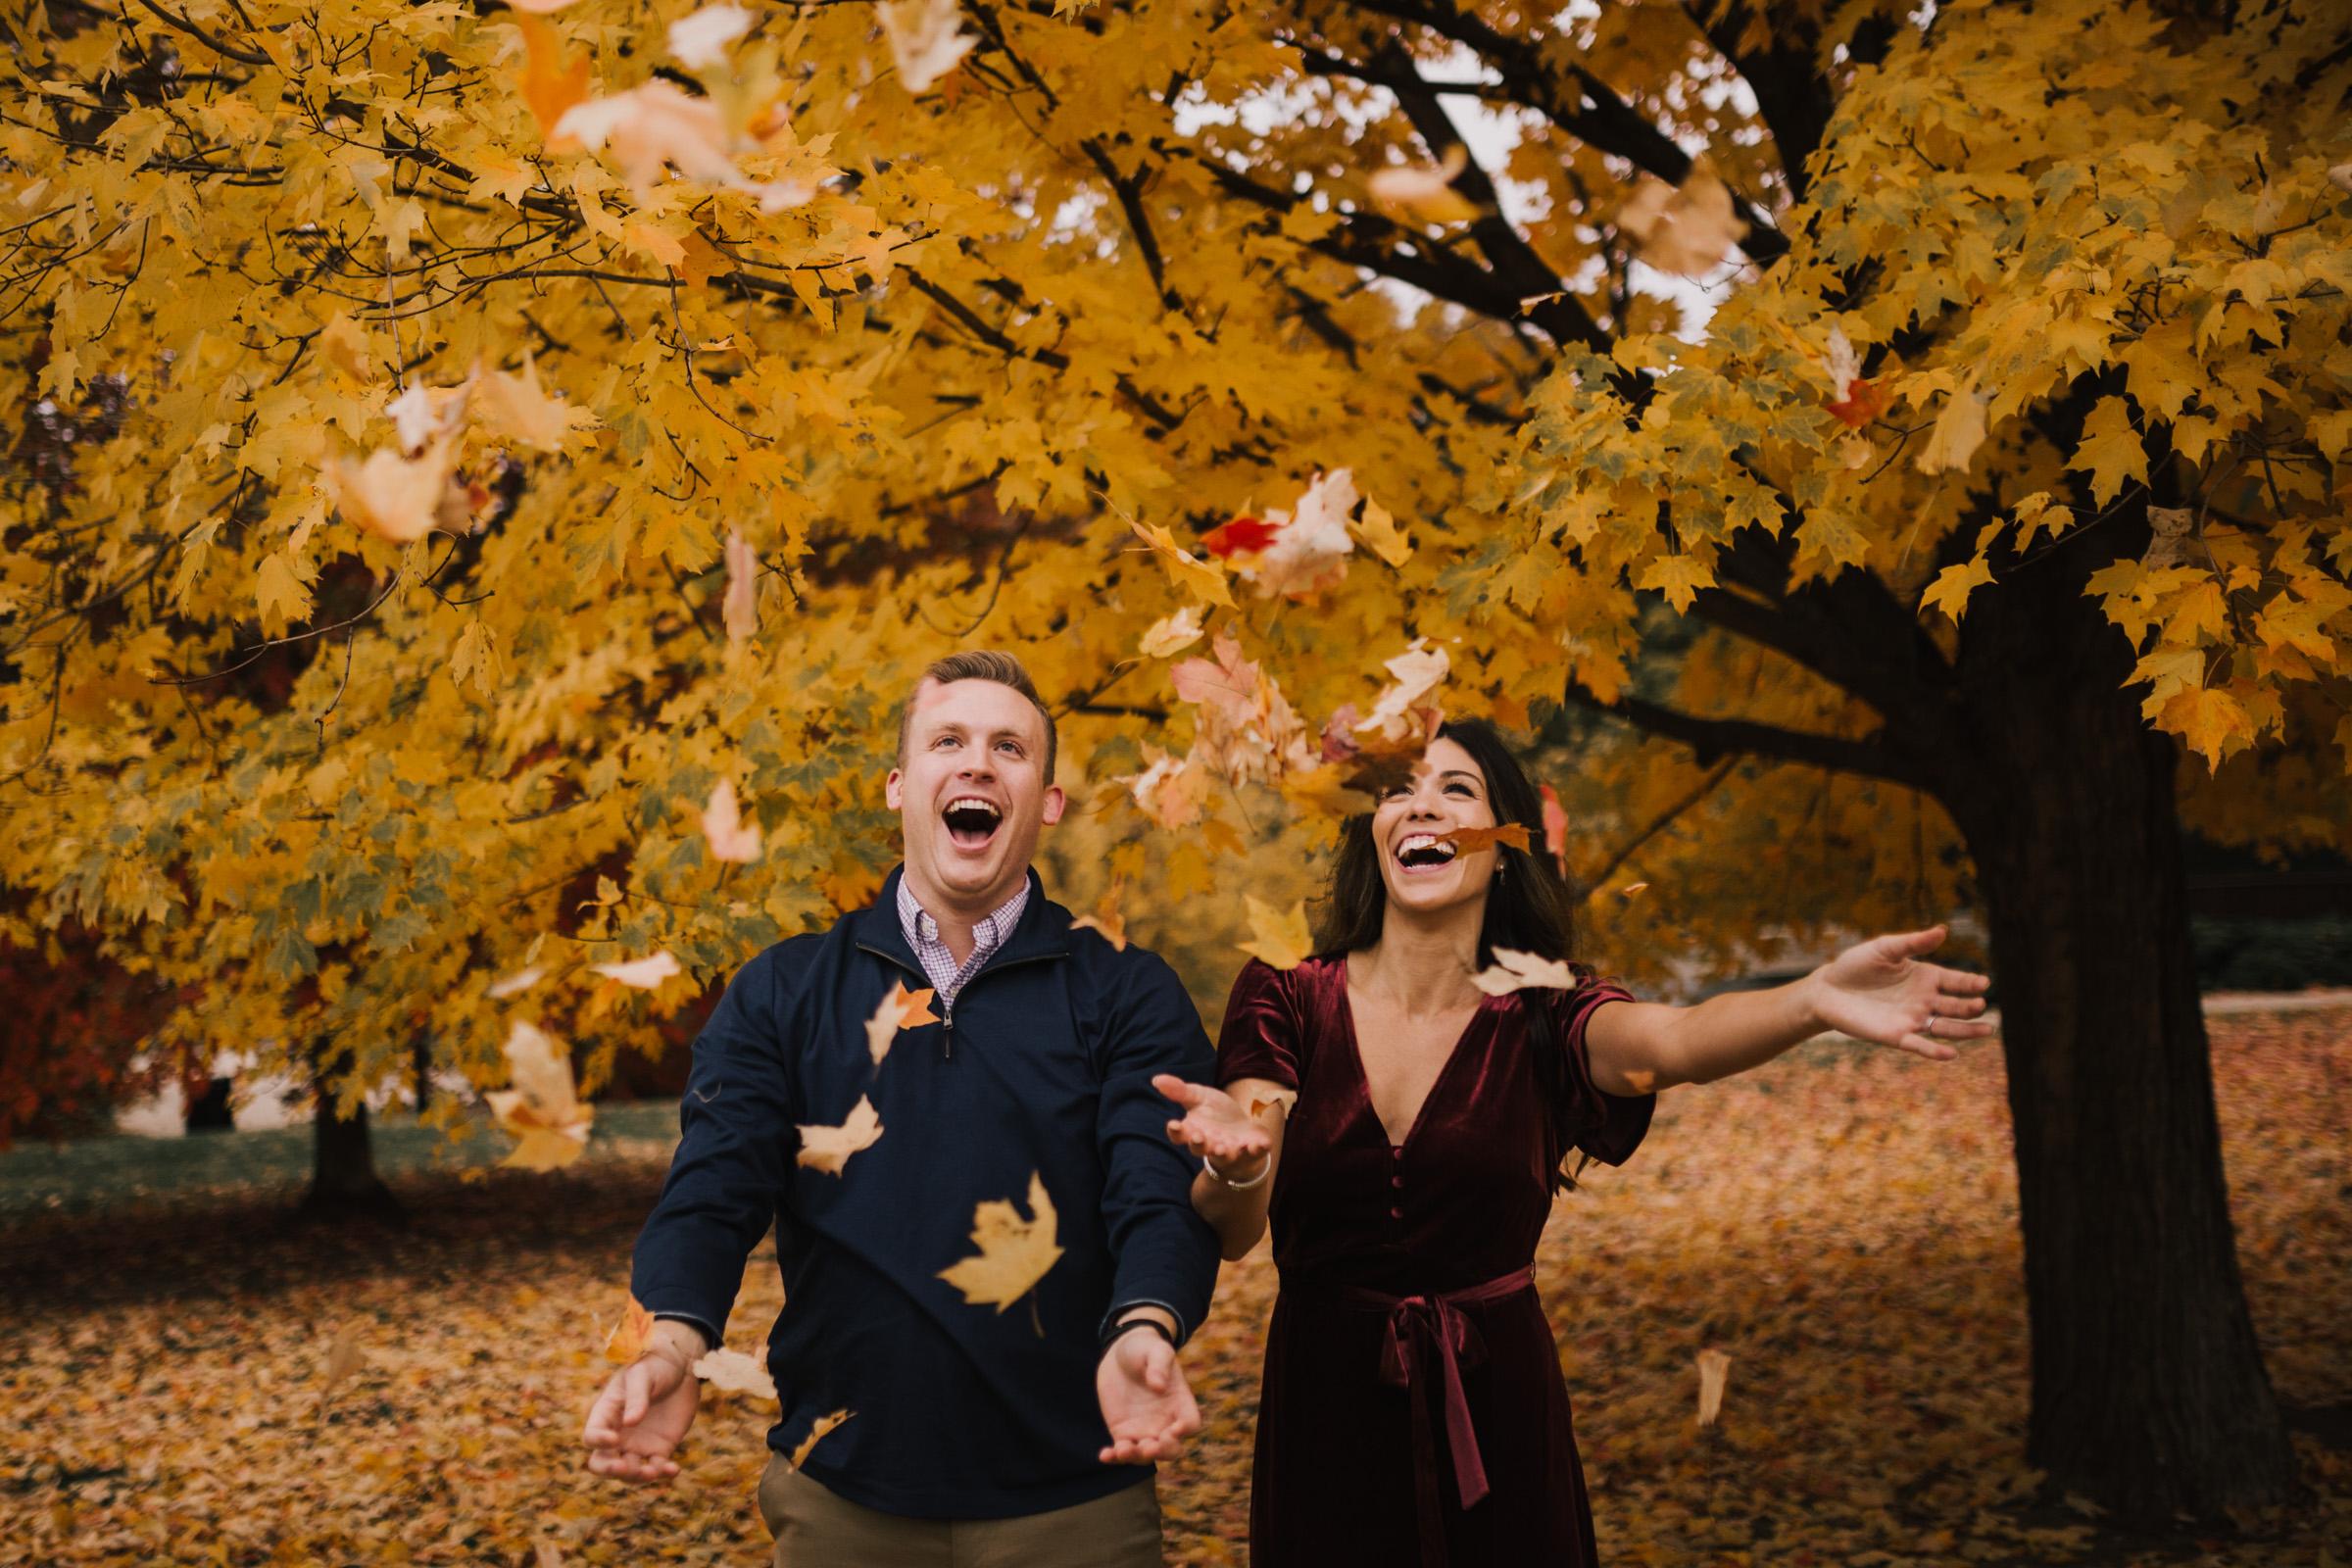 alyssa barletter photography loose park fall engagement photos autumn wedding photography-16.jpg